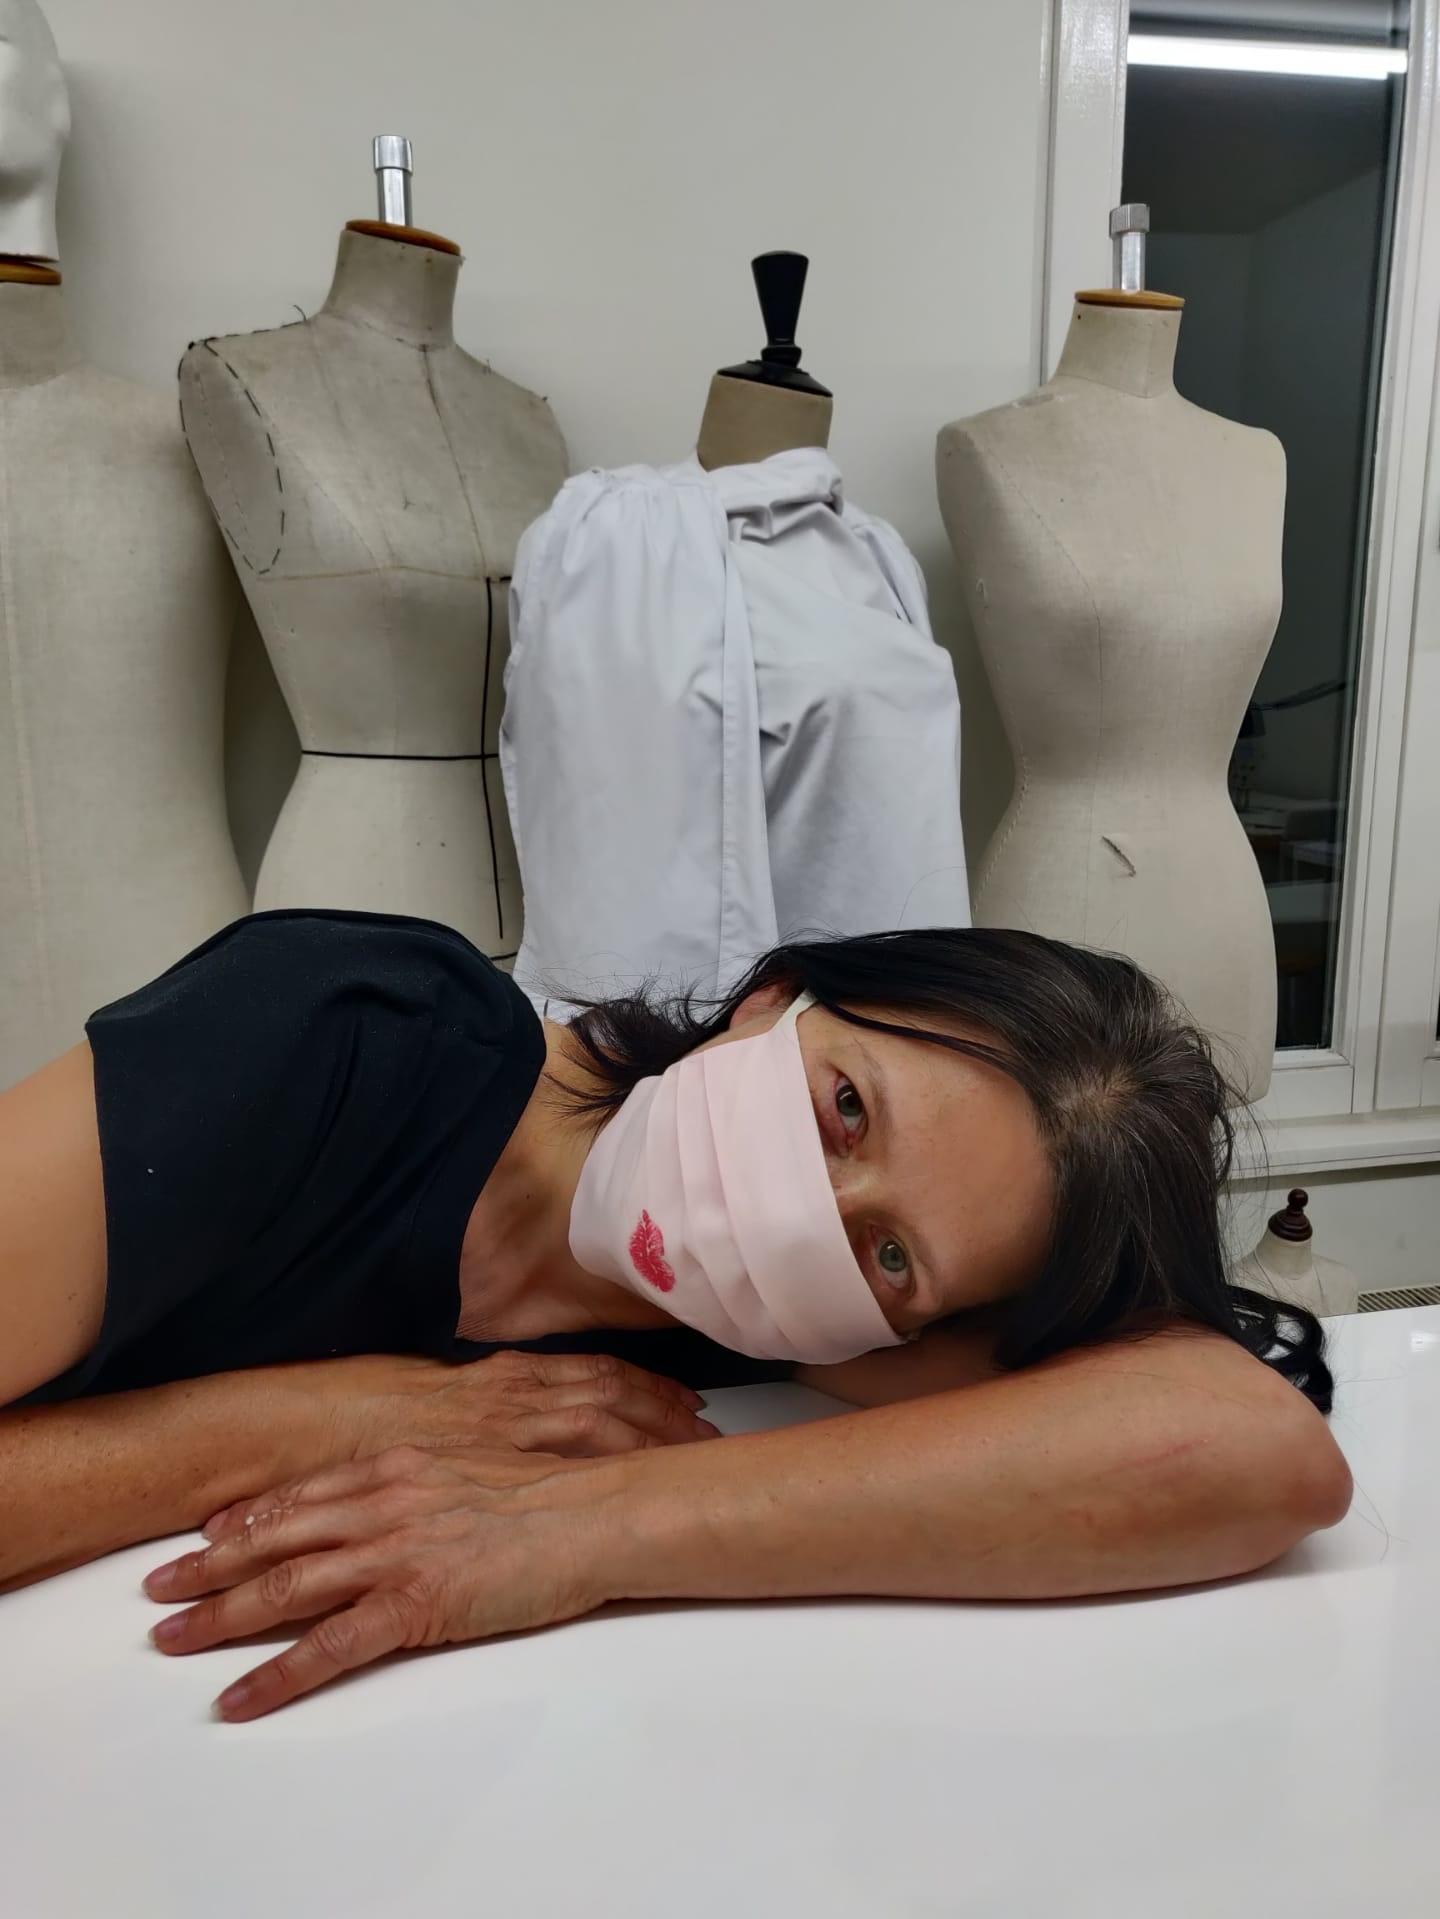 Elke Hoste, Pearl Blush Kiss mondmasker, collectie MAS, inv. nr MAS.0328.004, foto Duurzame Mondmaskers.